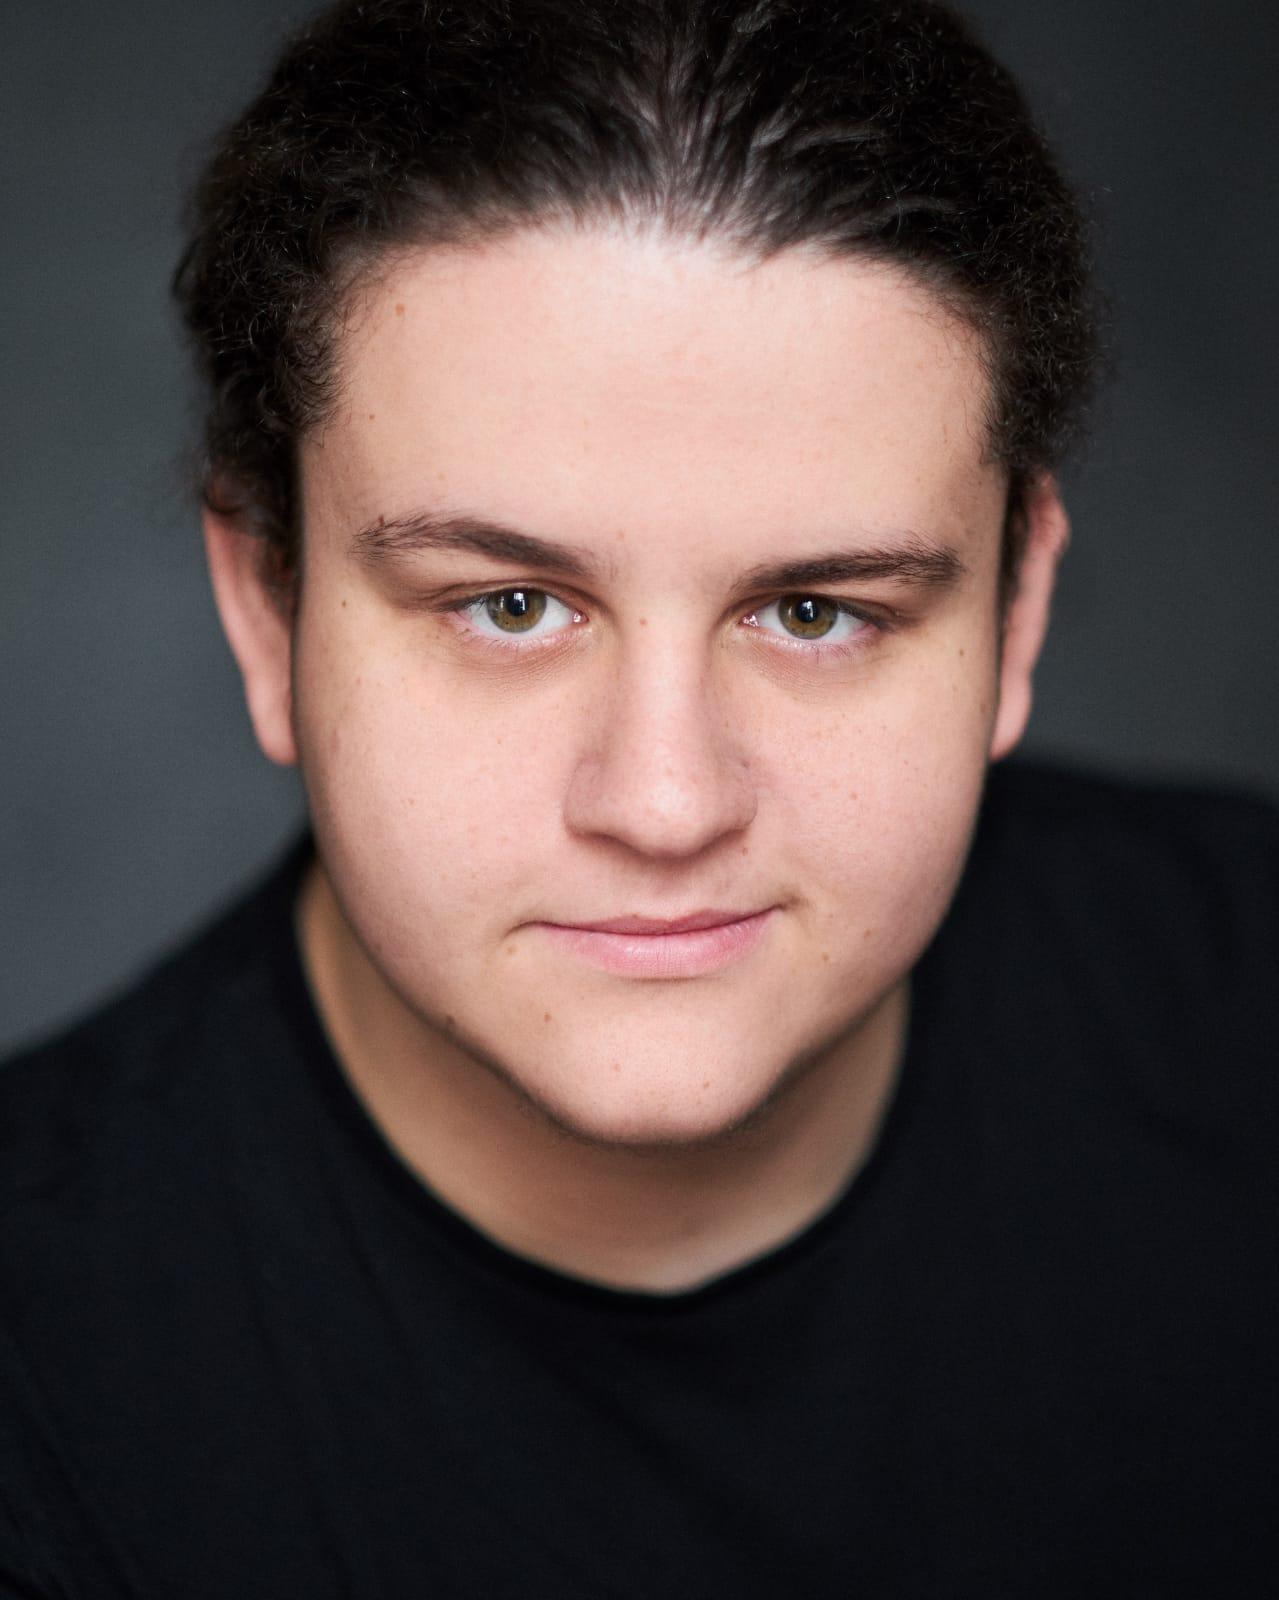 Jamie Ankrah - Dramaturg For Wooden Arrow's Creative ProjectsNational Youth Theatre REP CompanyOpen Door AlumniRoles:Performer